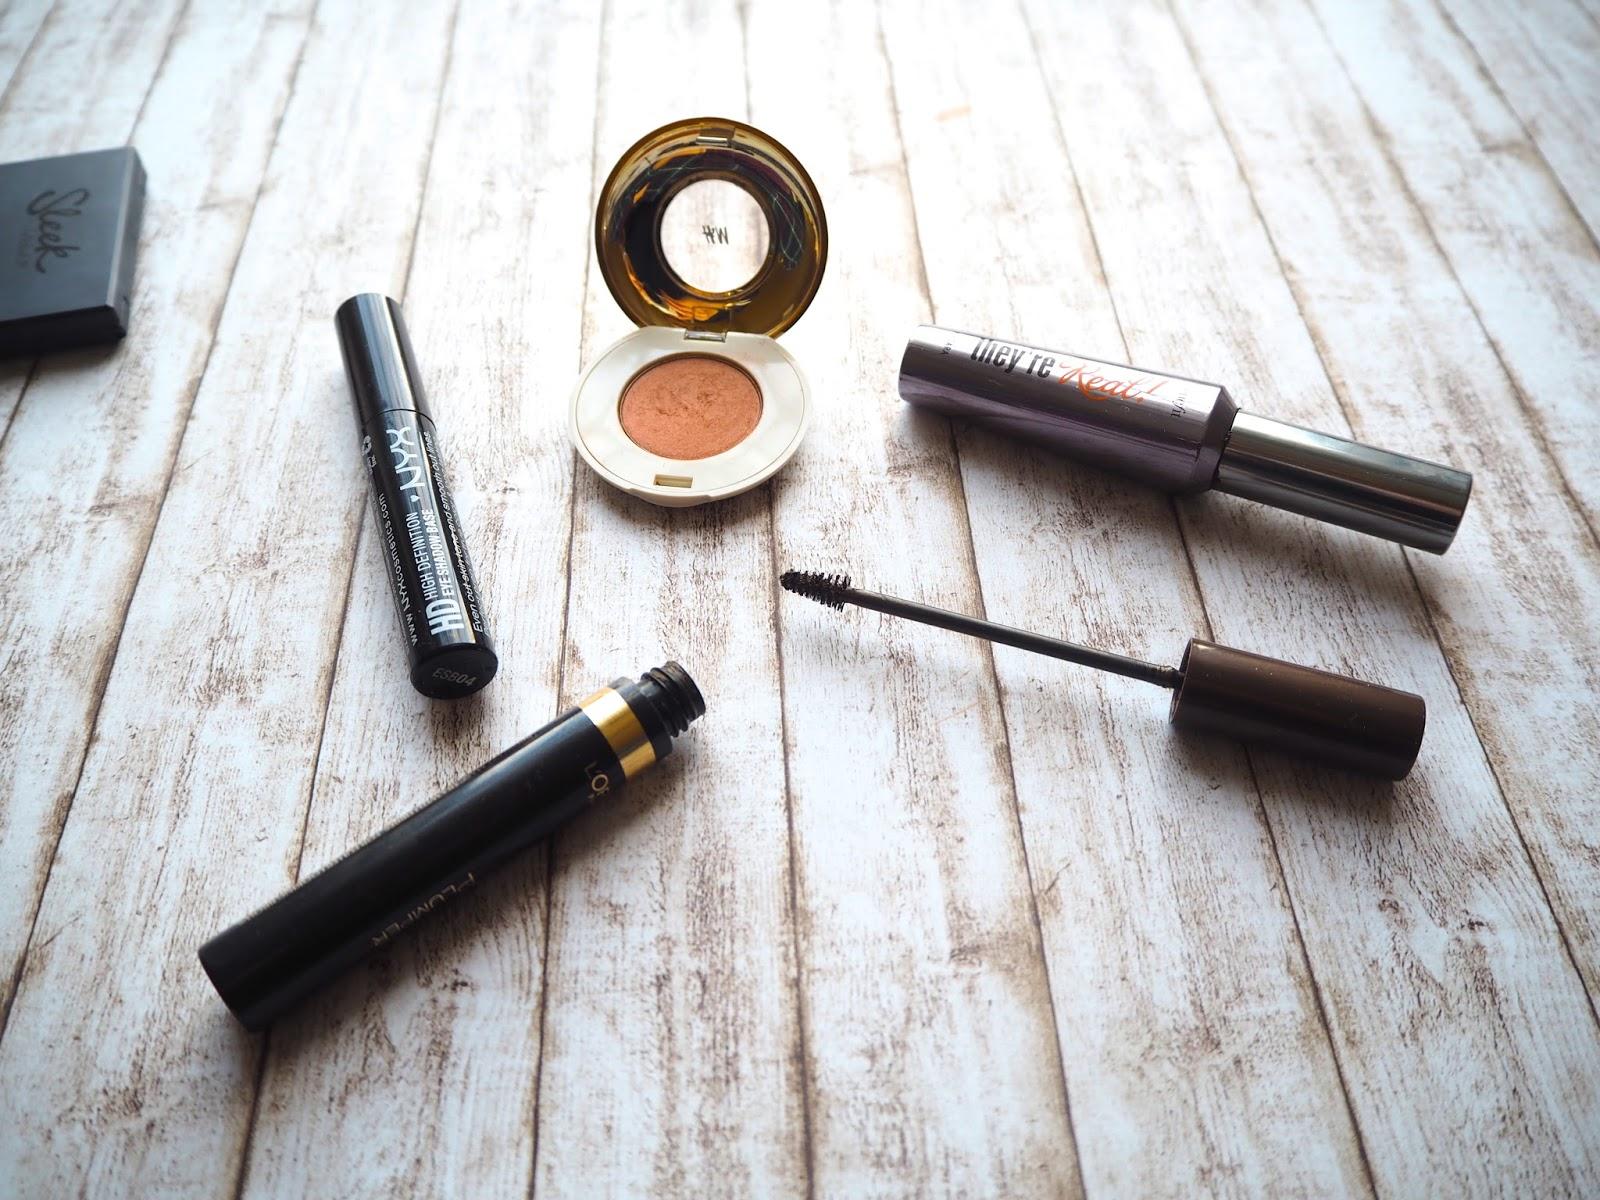 Drugstore Makeup Edit, affordable makeup, hm beauty, russet rose, eyeshadow, loreal brow artist plumper, nyx